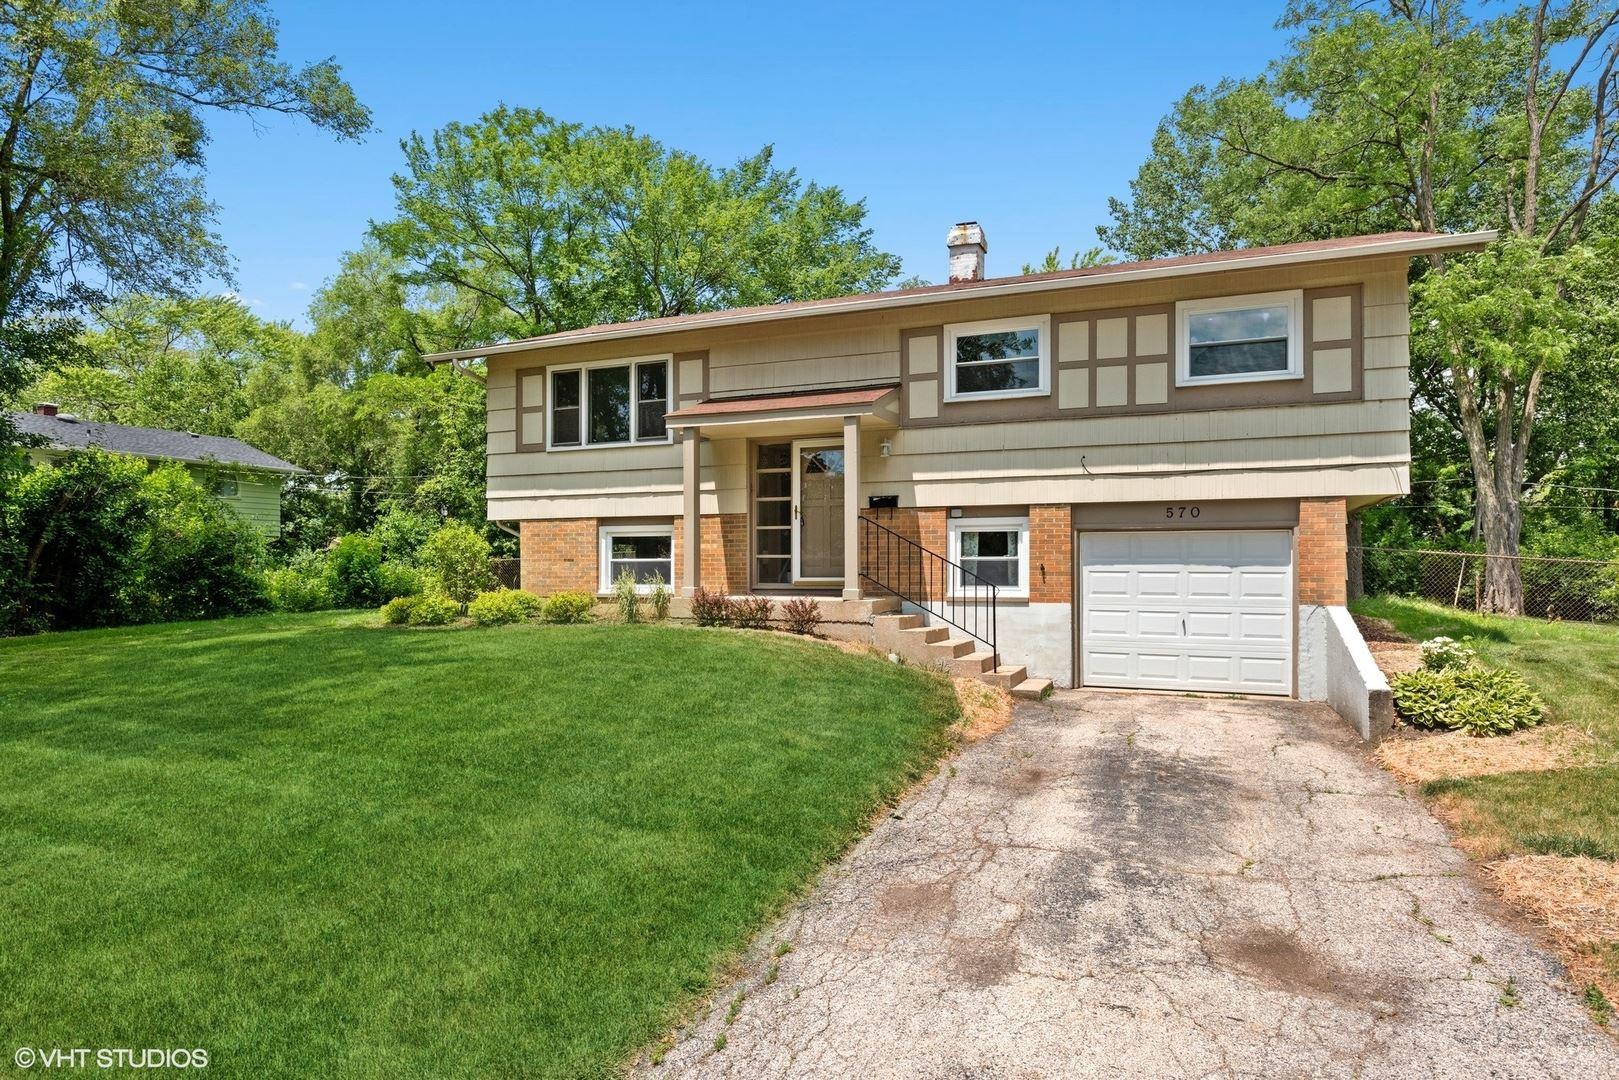 570 Briarcliff Lane, Hoffman Estates, IL 60169 - #: 11128206